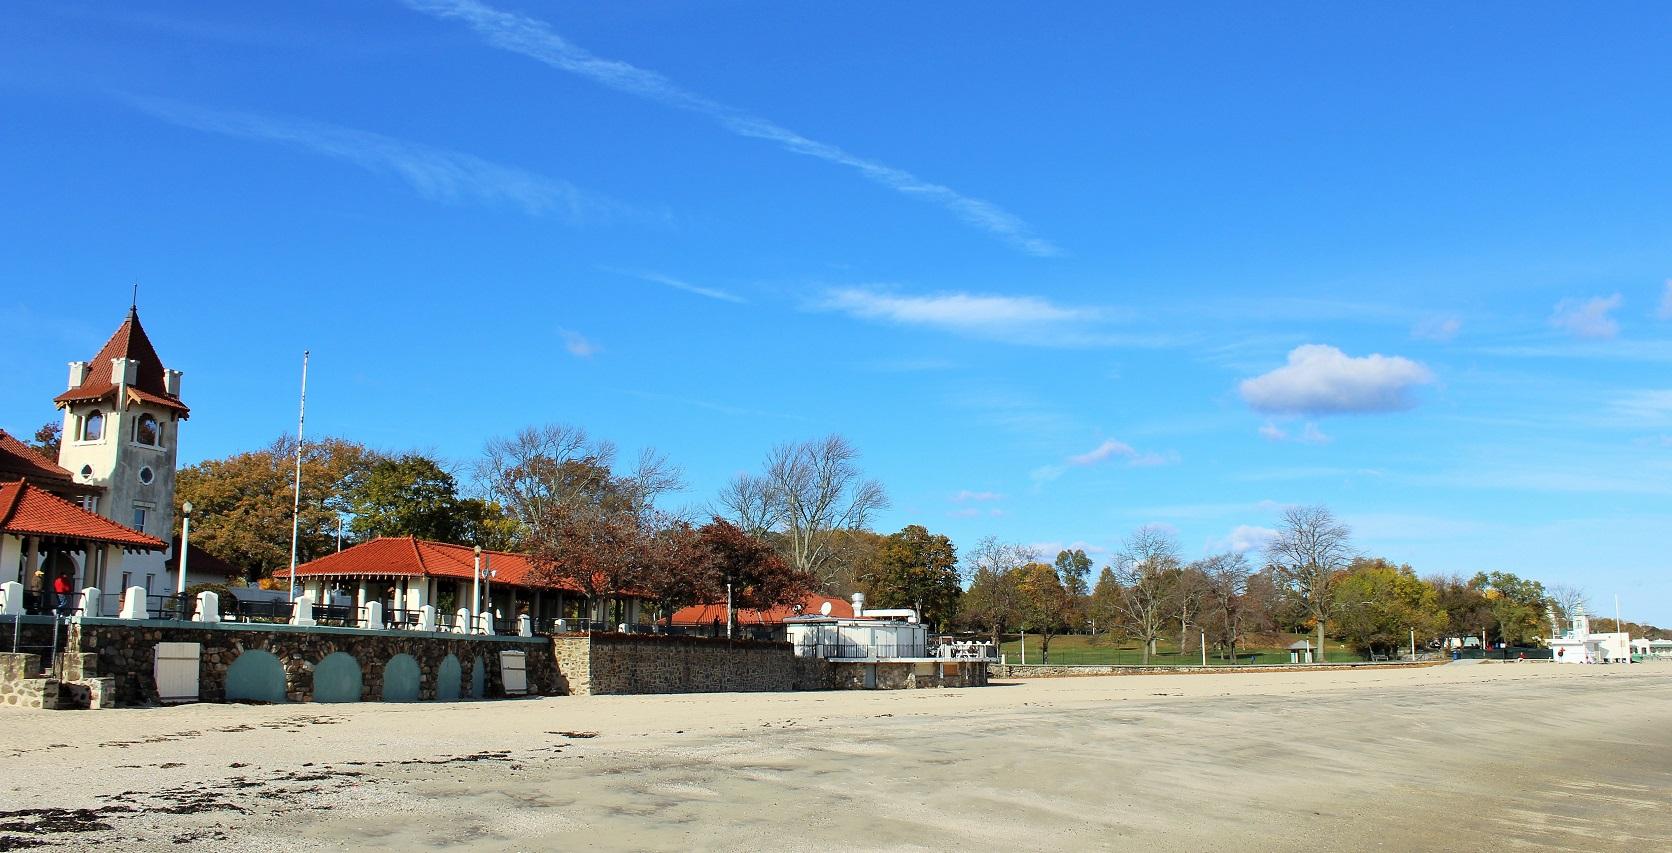 Rye Town Park